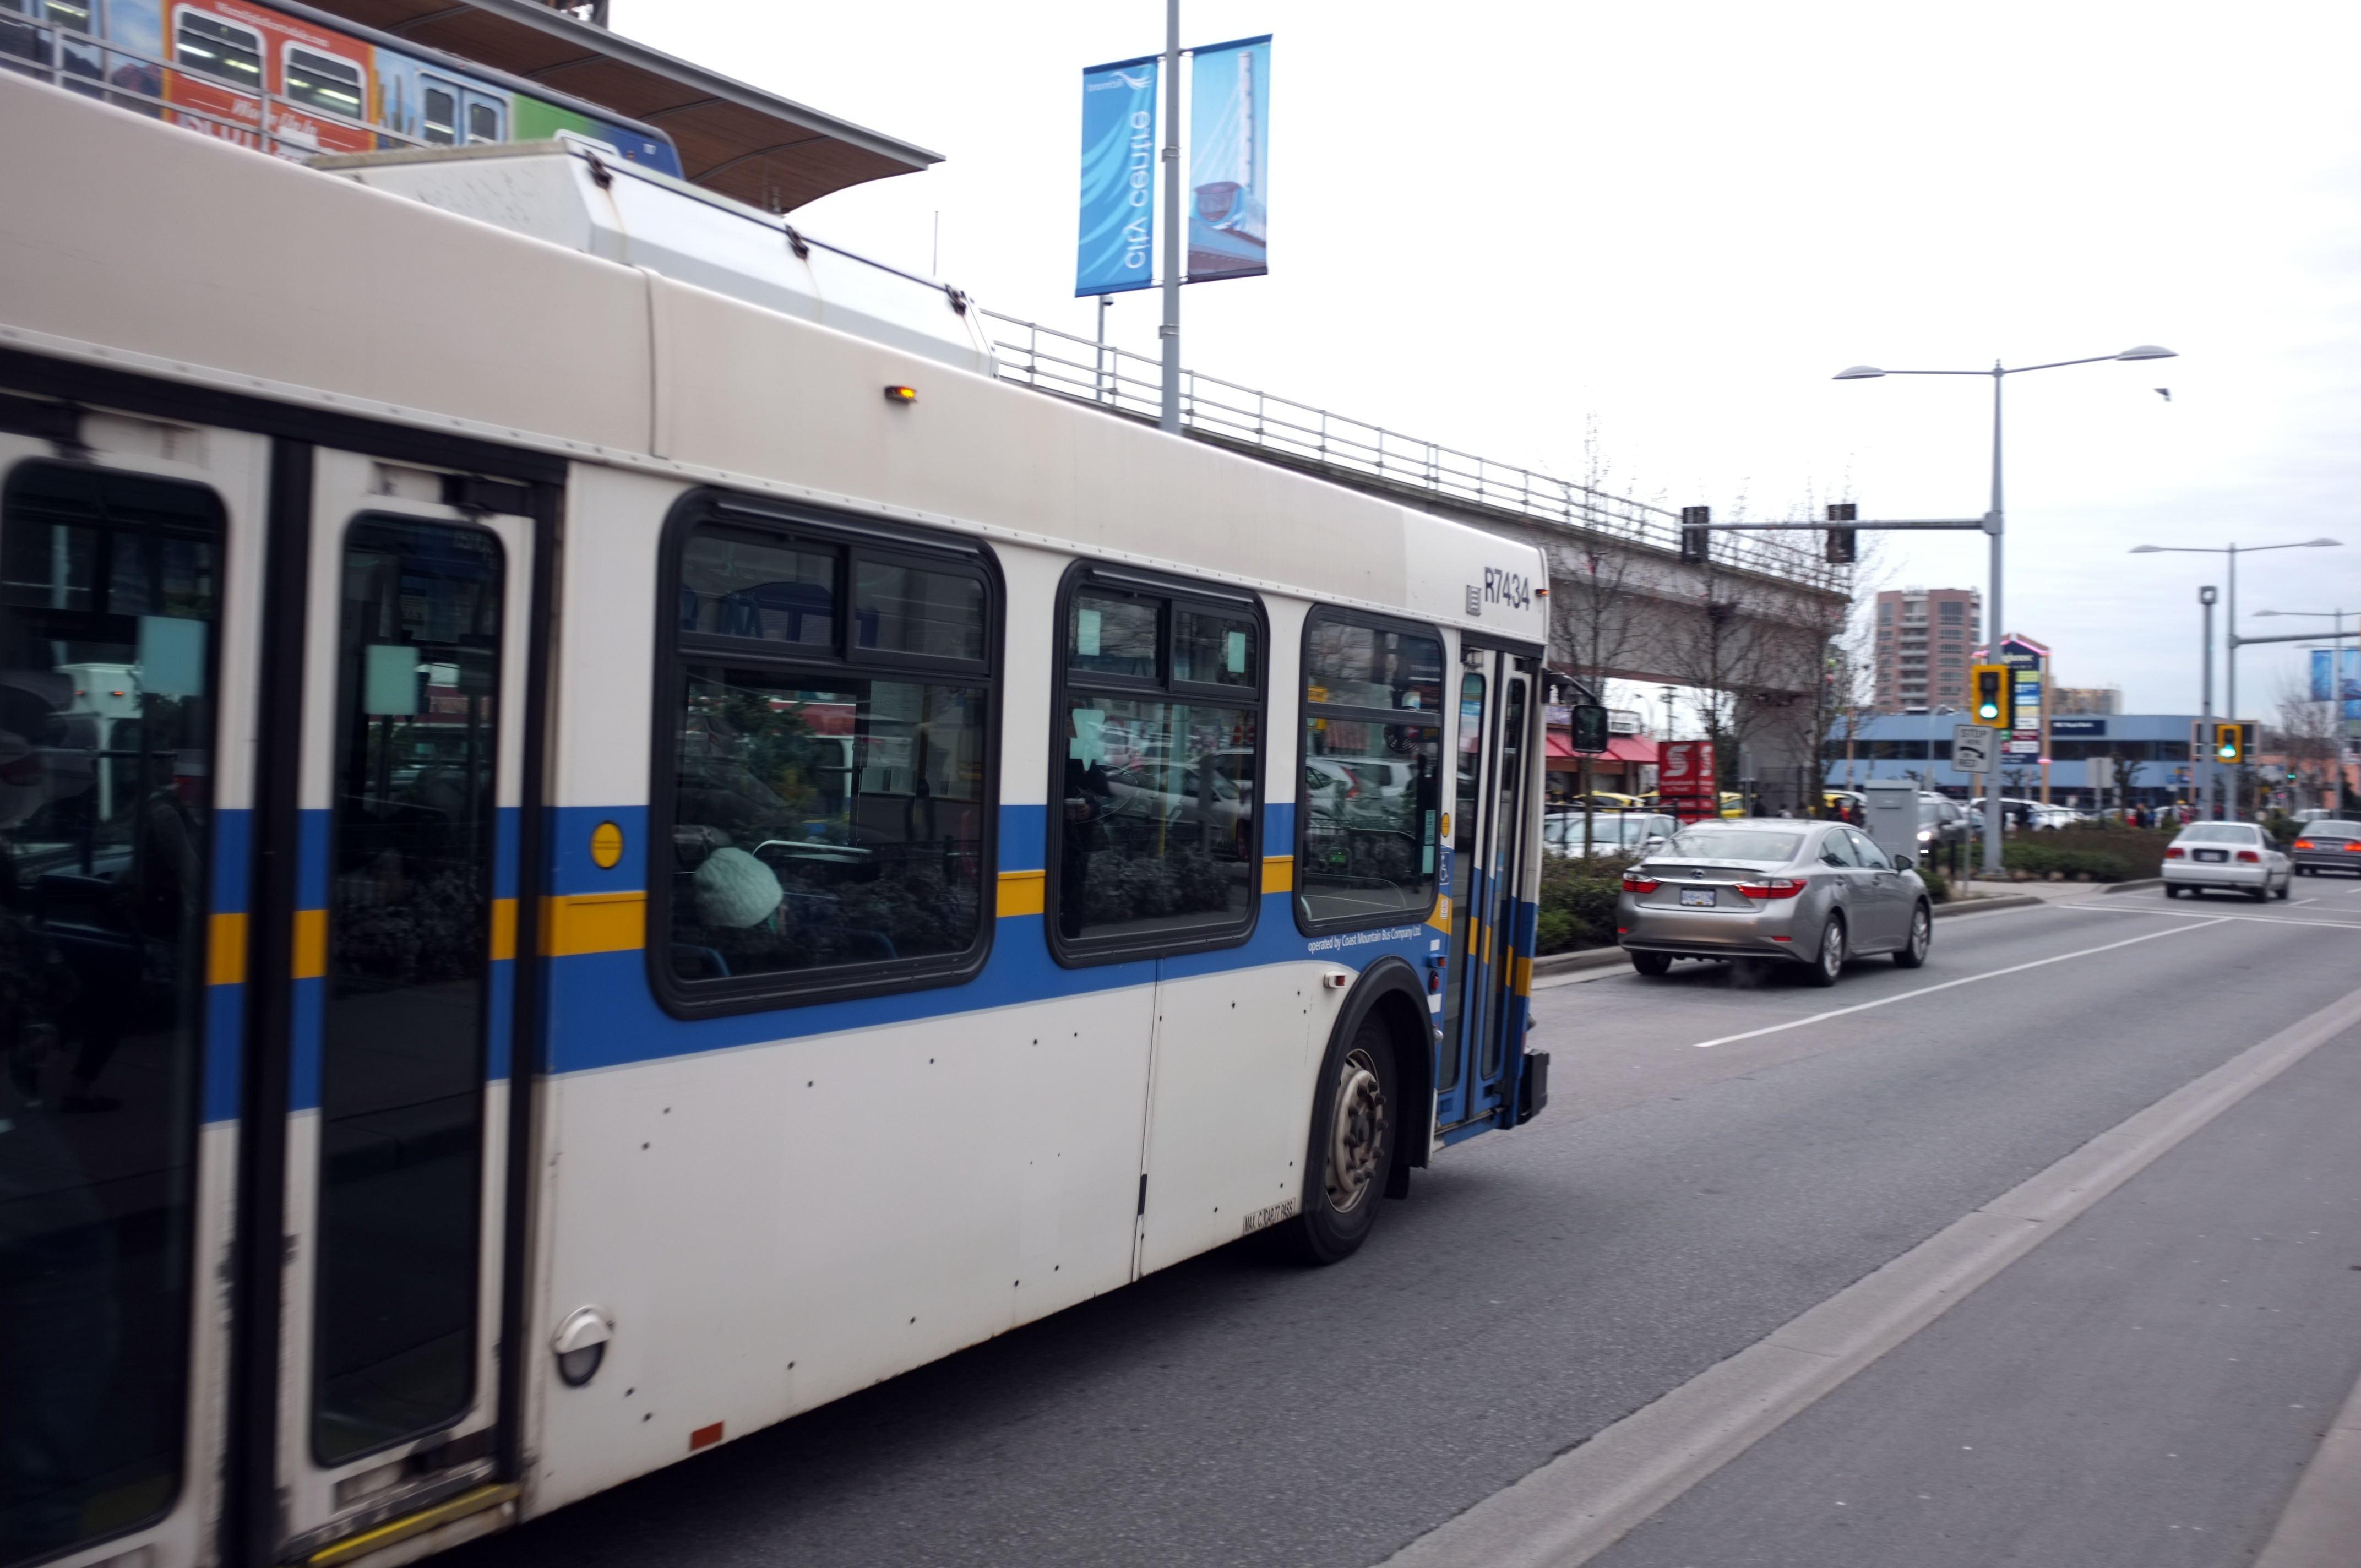 Bus_in_traffic.jpg